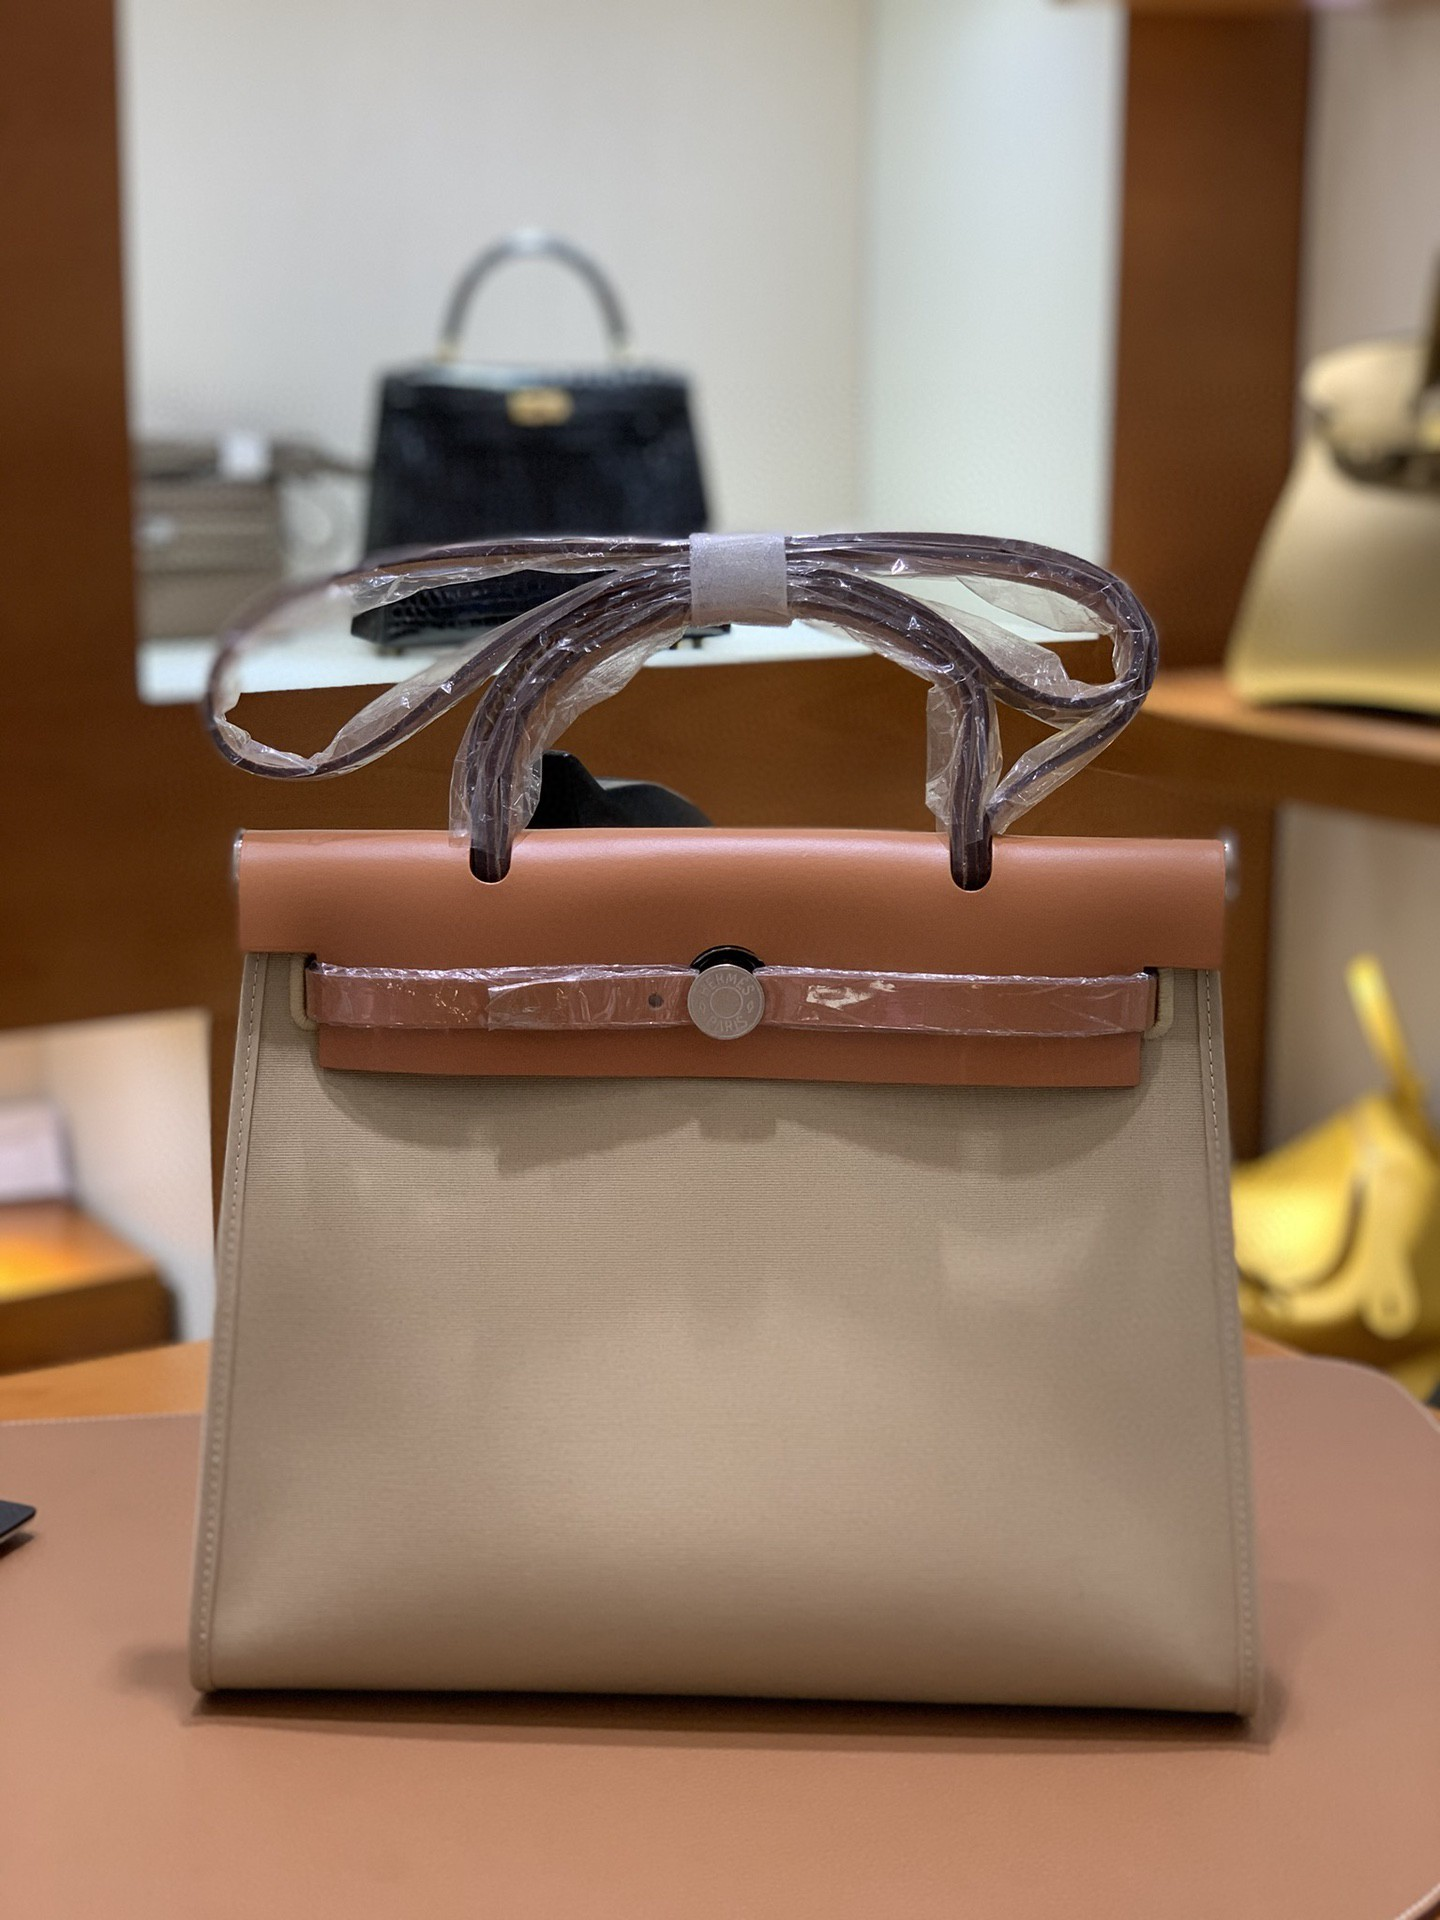 Hermès(爱马仕)Herbag 金棕色拼风衣灰 Box帆布 银扣 31cm